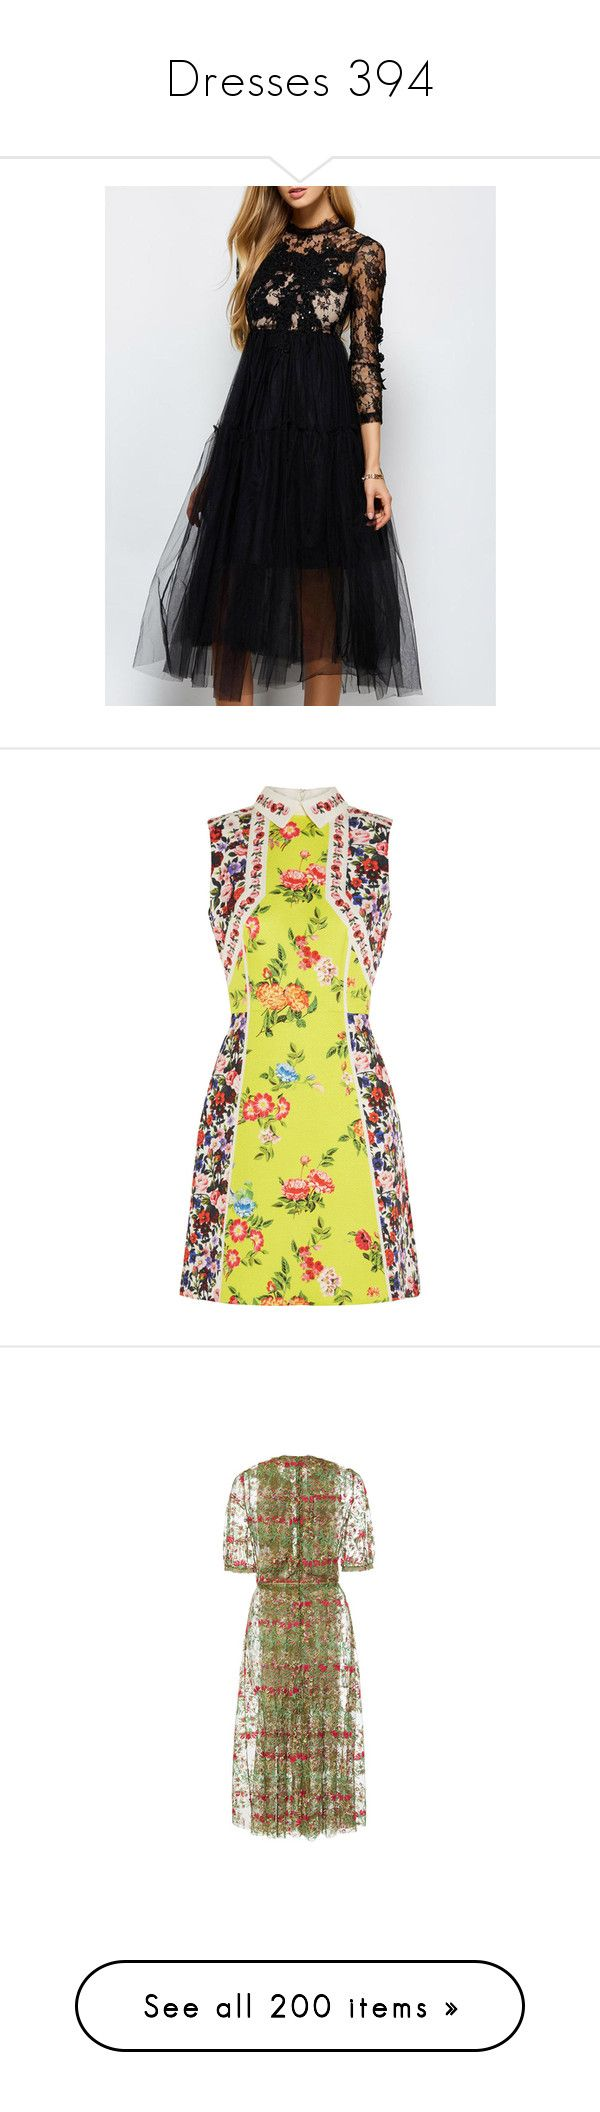 """Dresses 394"" by singlemom ❤ liked on Polyvore featuring dresses, sequin dress, sequin cocktail dresses, tulle cocktail dresses, sequin tulle dress, sequin embellished dress, vestidos, mary katrantzou, yellow and pattern dress"